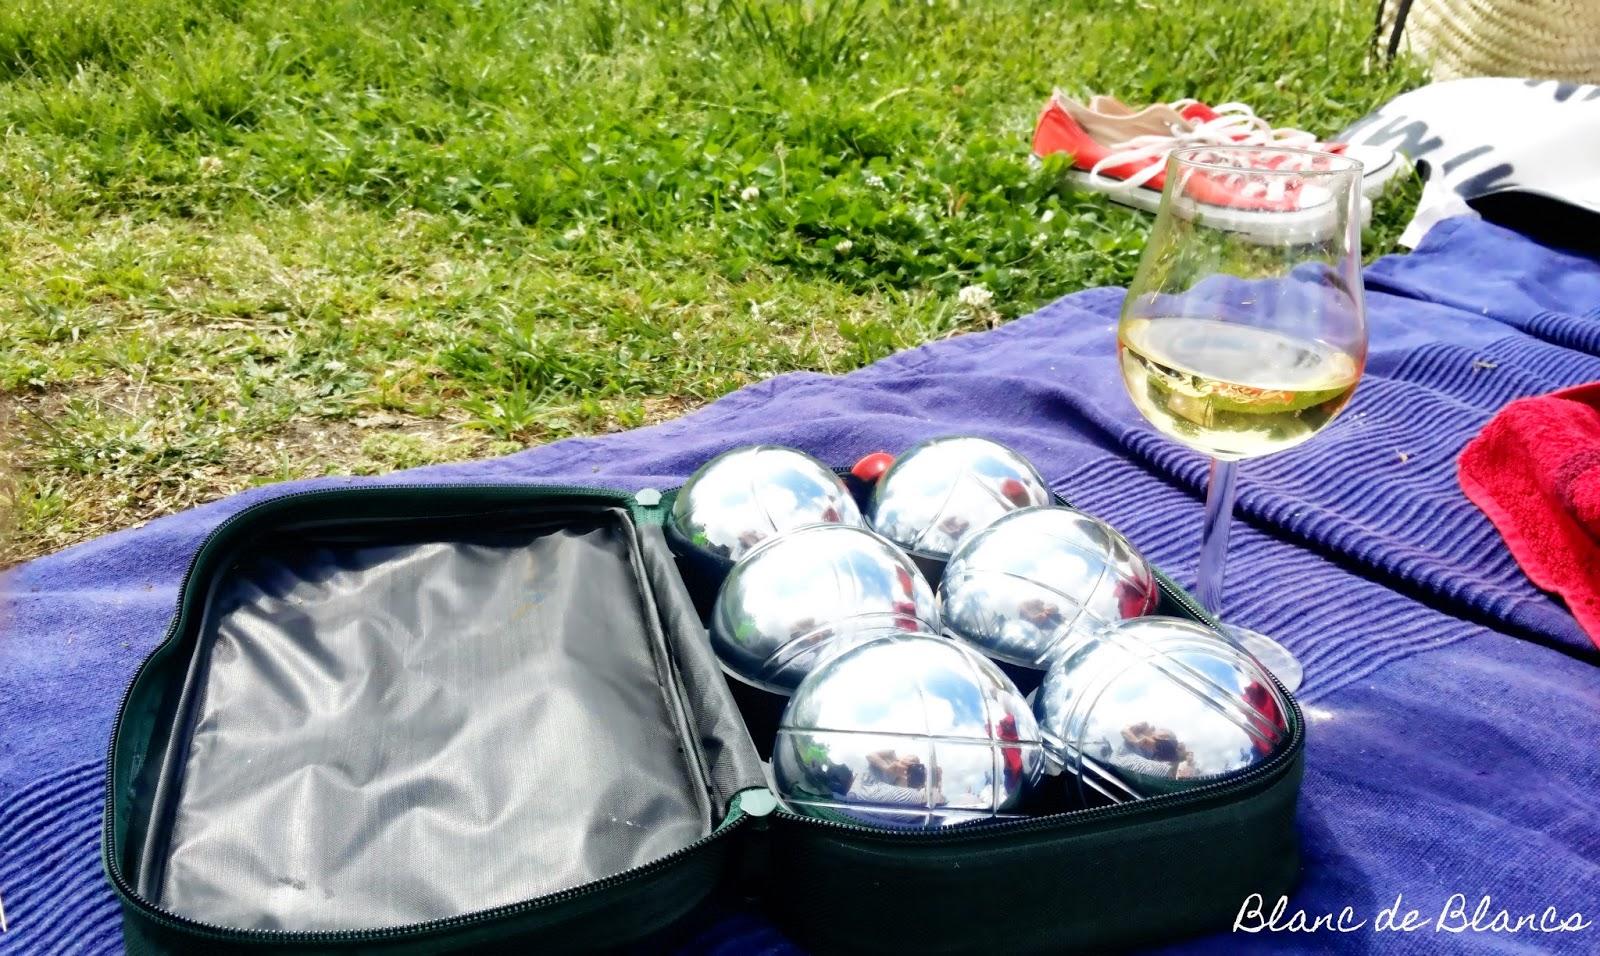 Piknikillä: boules ja valkoviini - www.blancdeblancs.fi